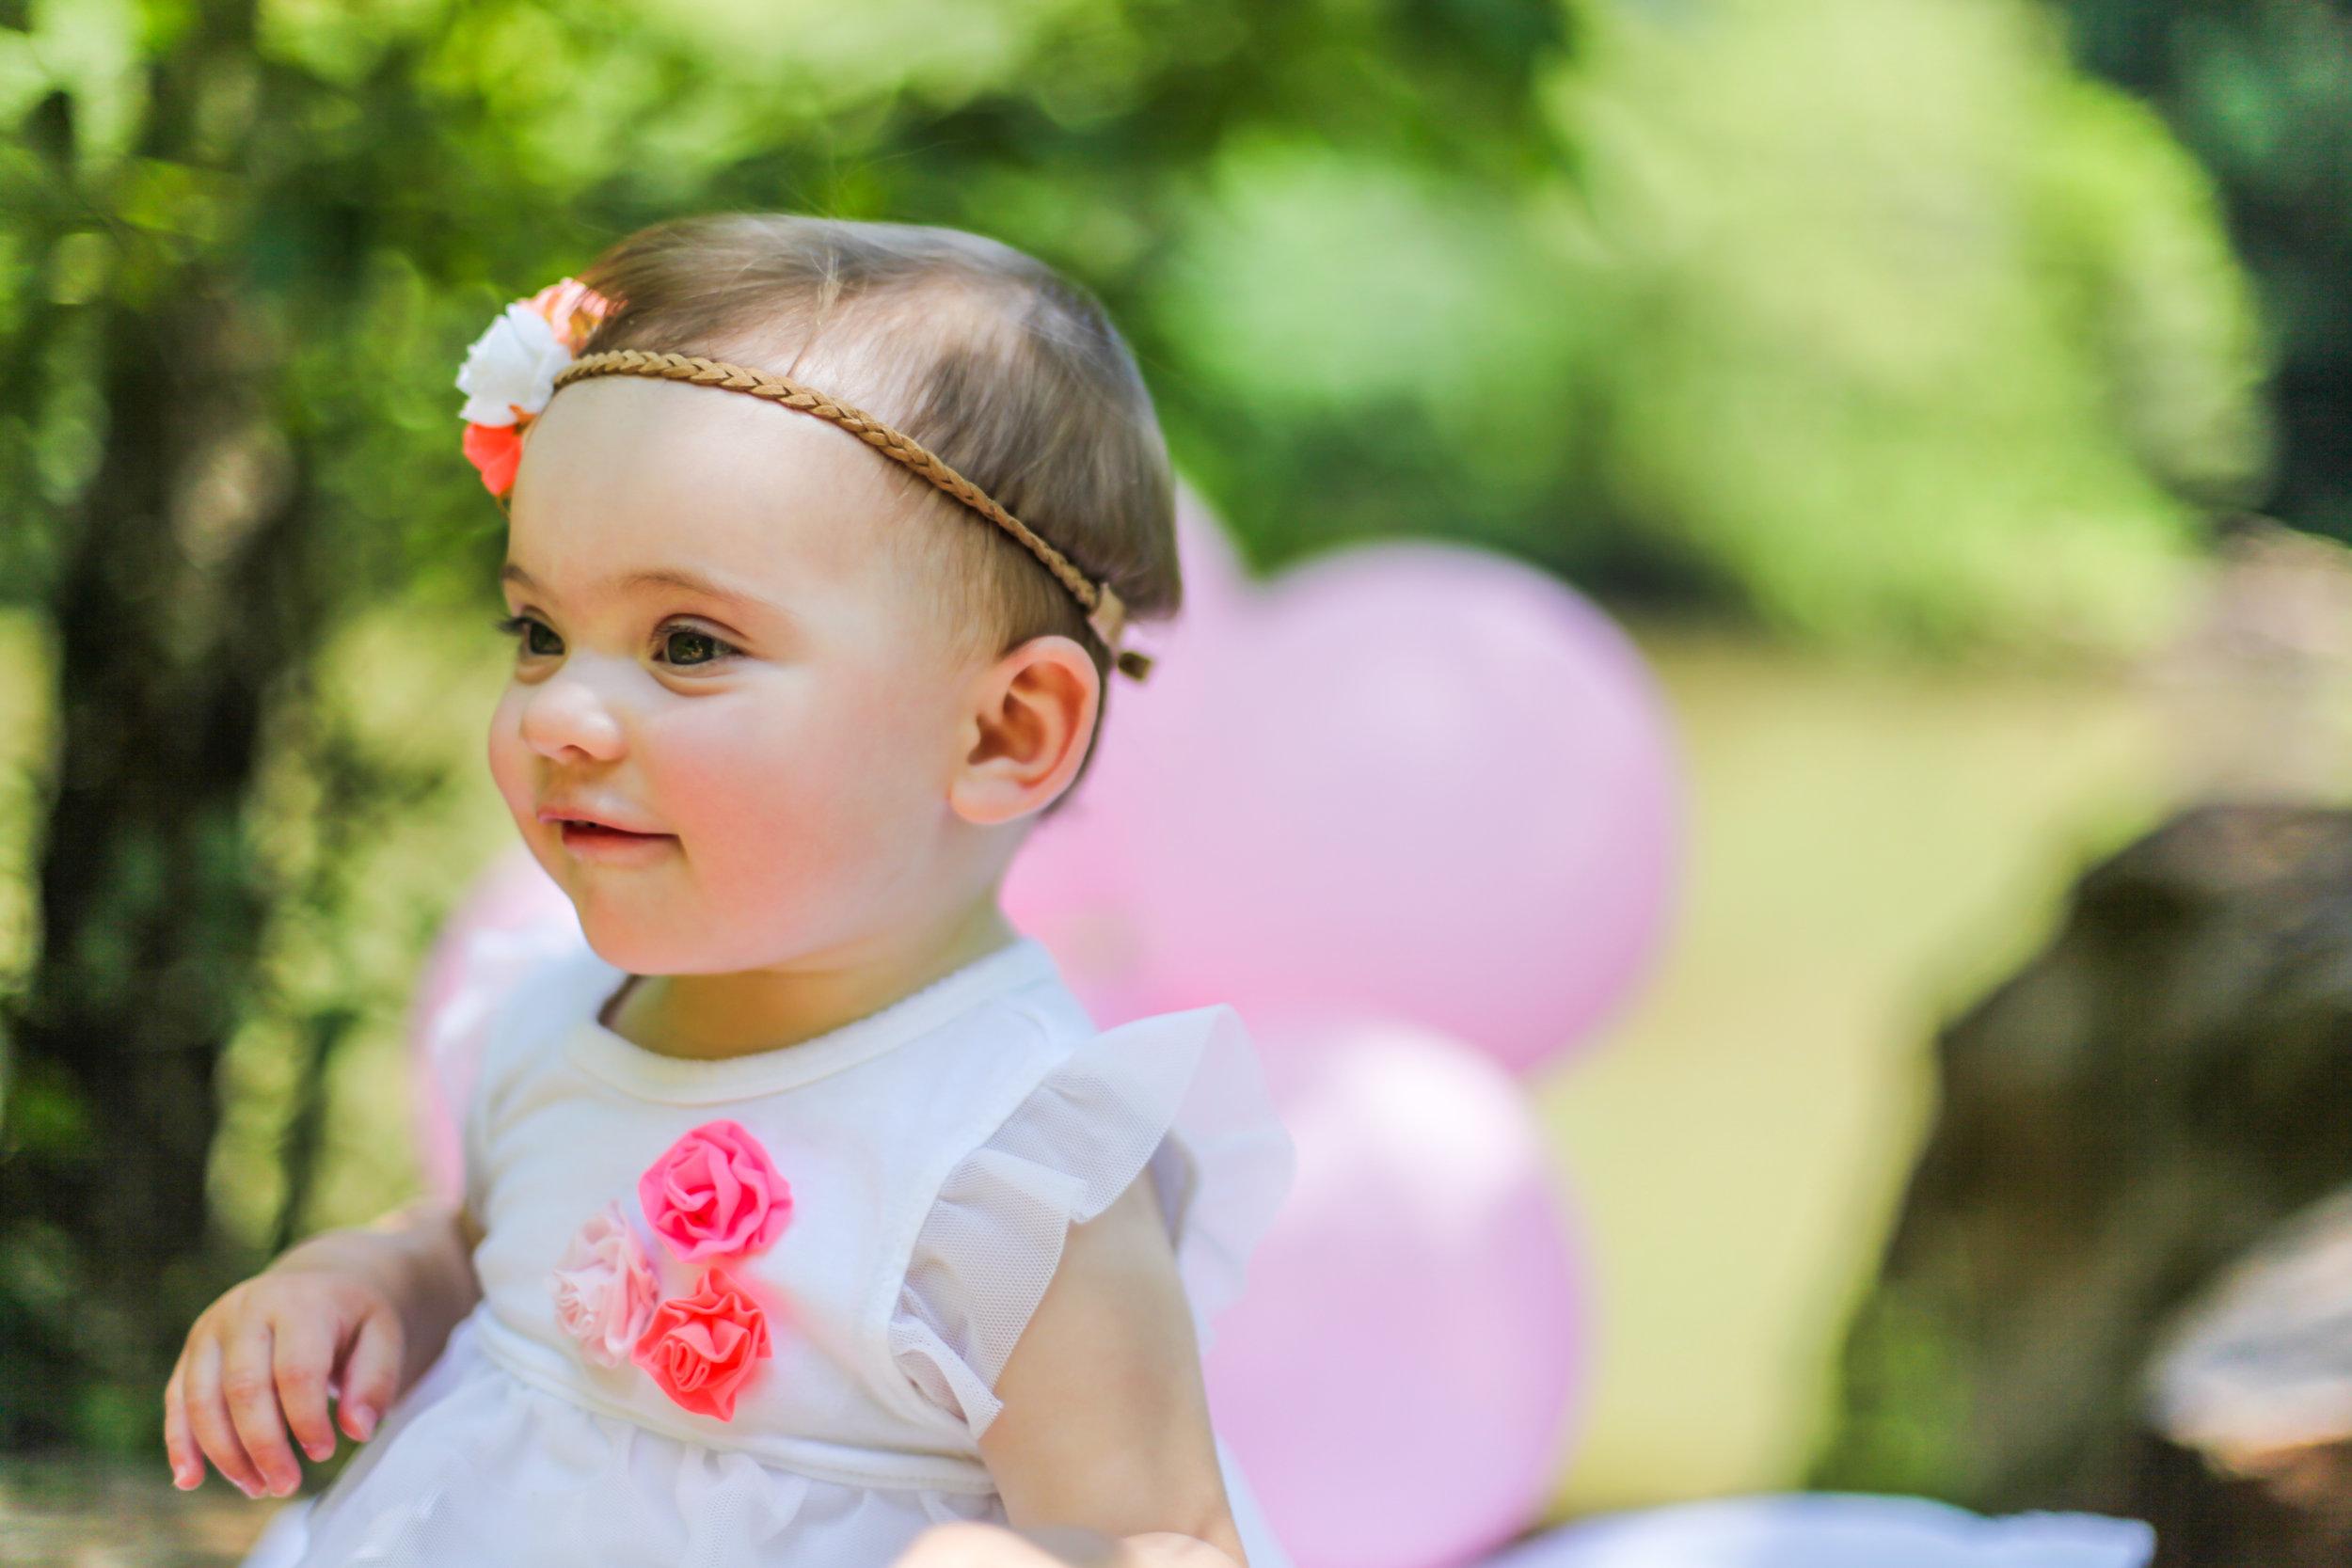 woodstock baby photography angela elliott-74.jpg